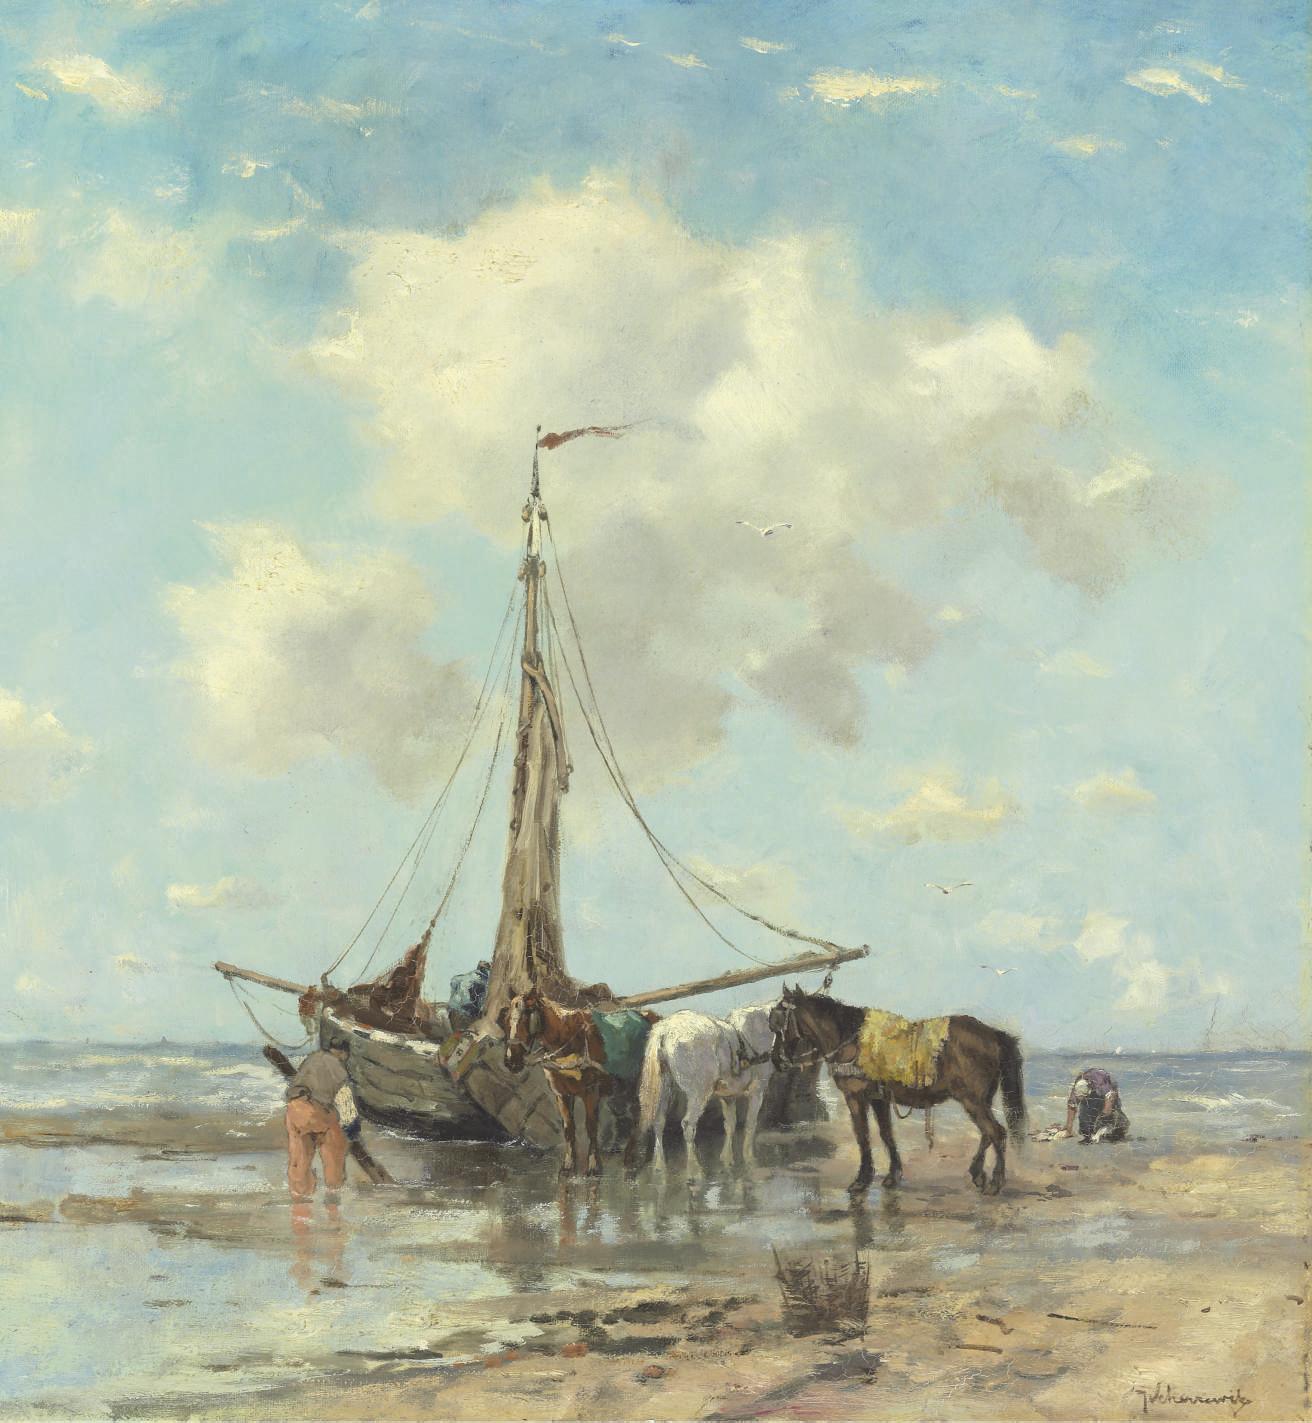 Johan Frederik Cornelis Scherr